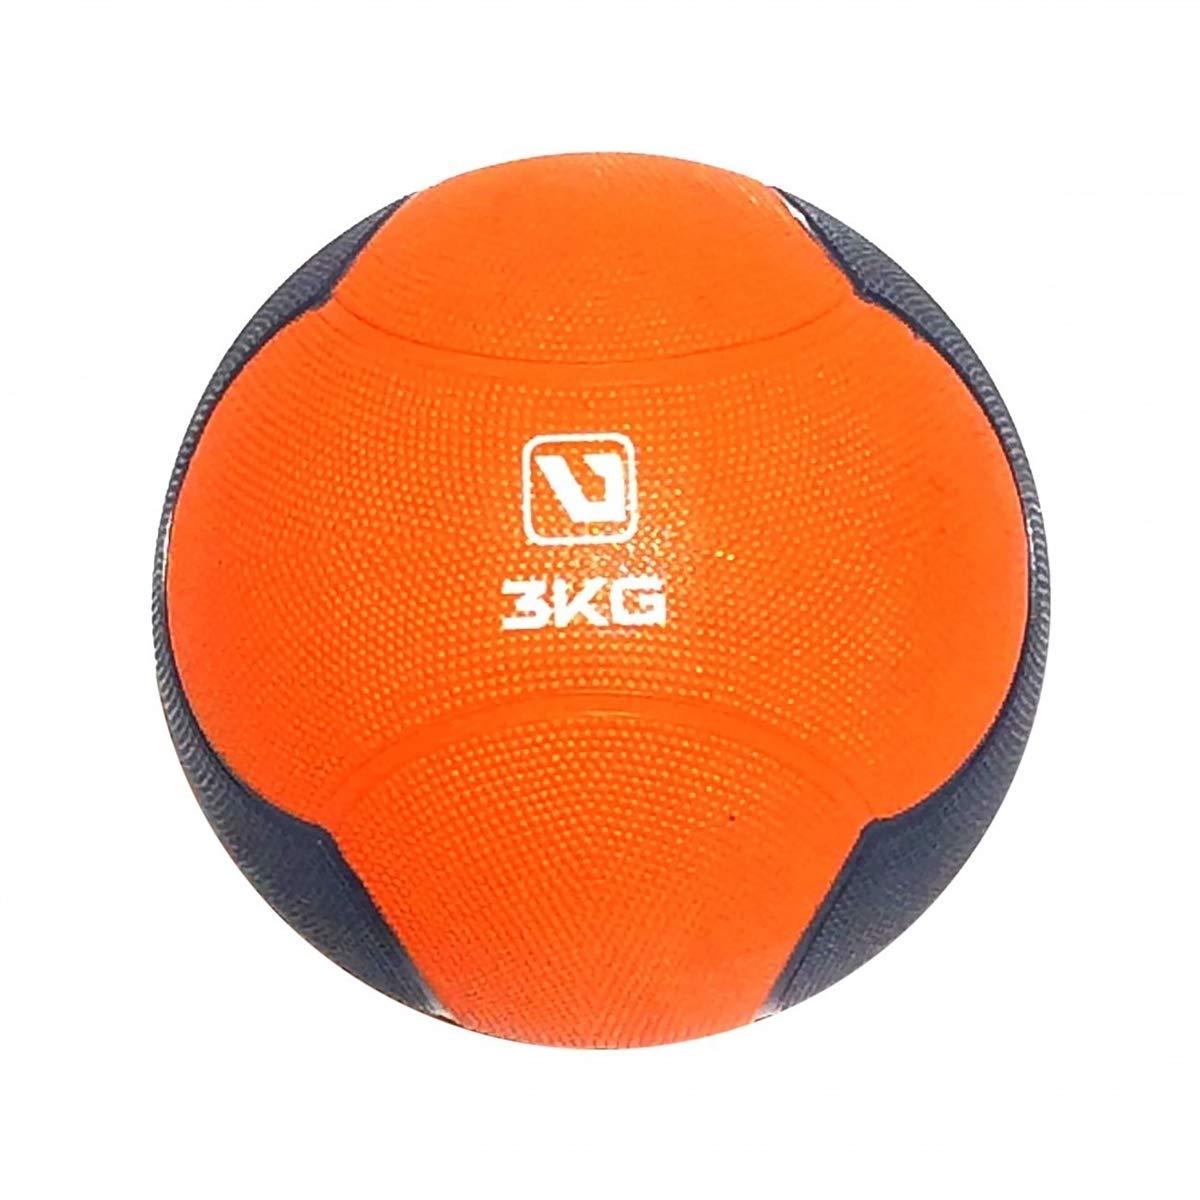 LiveUP Sports - Palla Medica 3kg Medicine Ball Professional Cross Training Core Palestra Esercizi Fitness, Orange